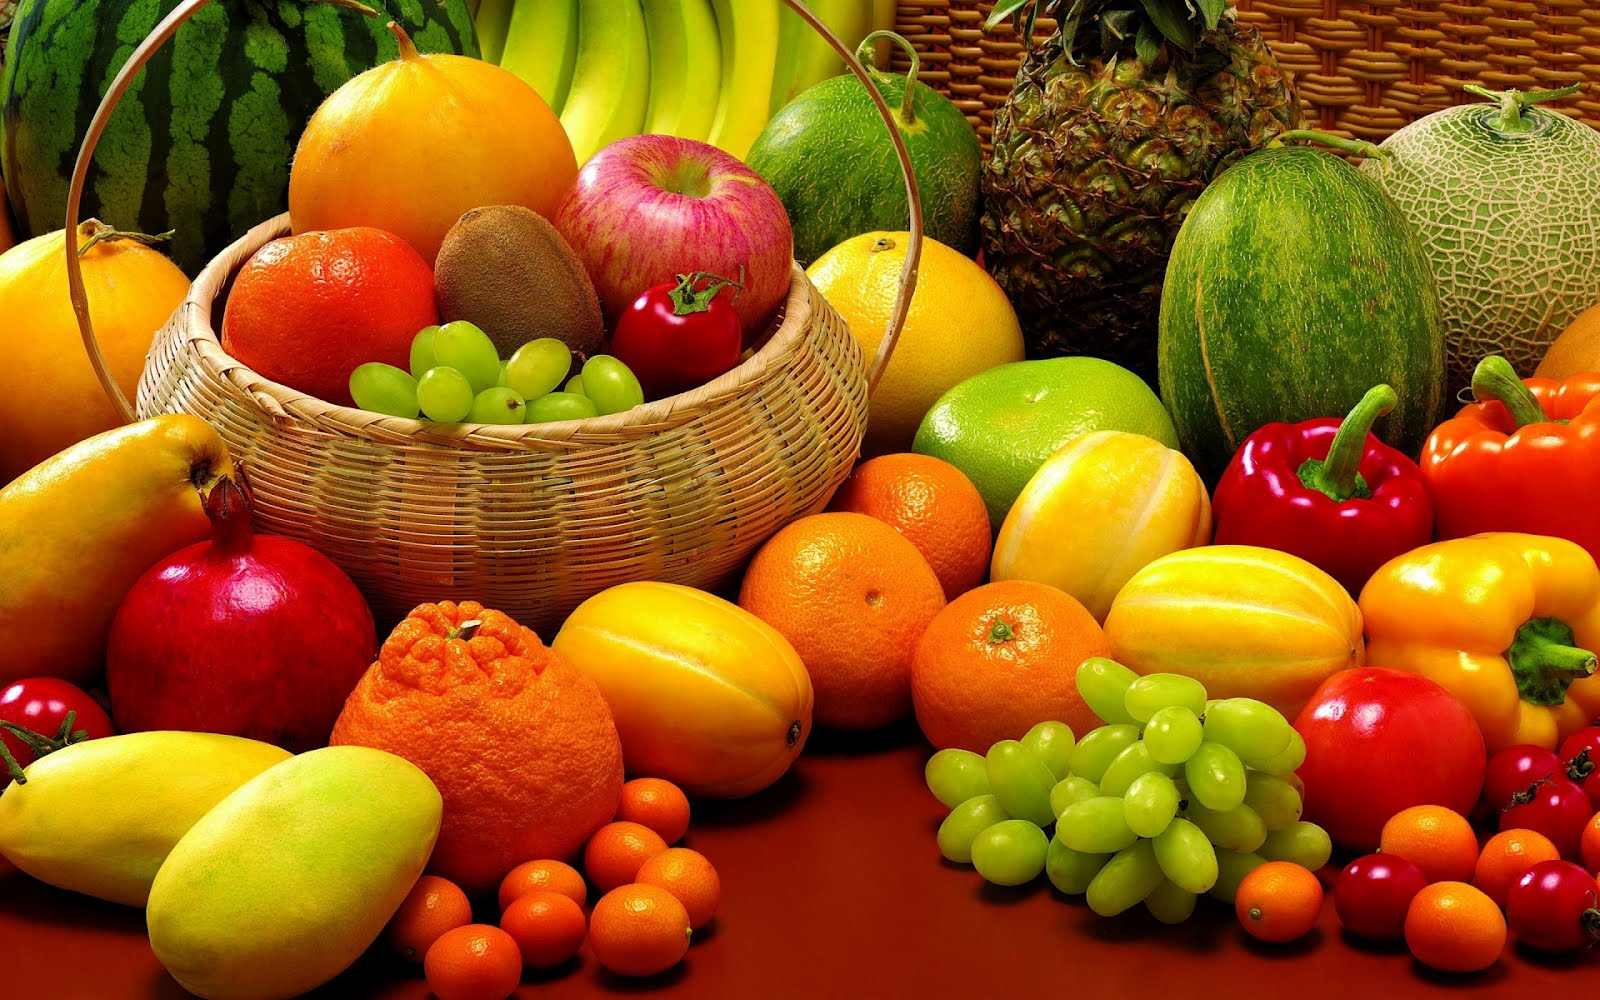 Perú ingresa al Top 5 de los mayores proveedores de fruta fresca a China